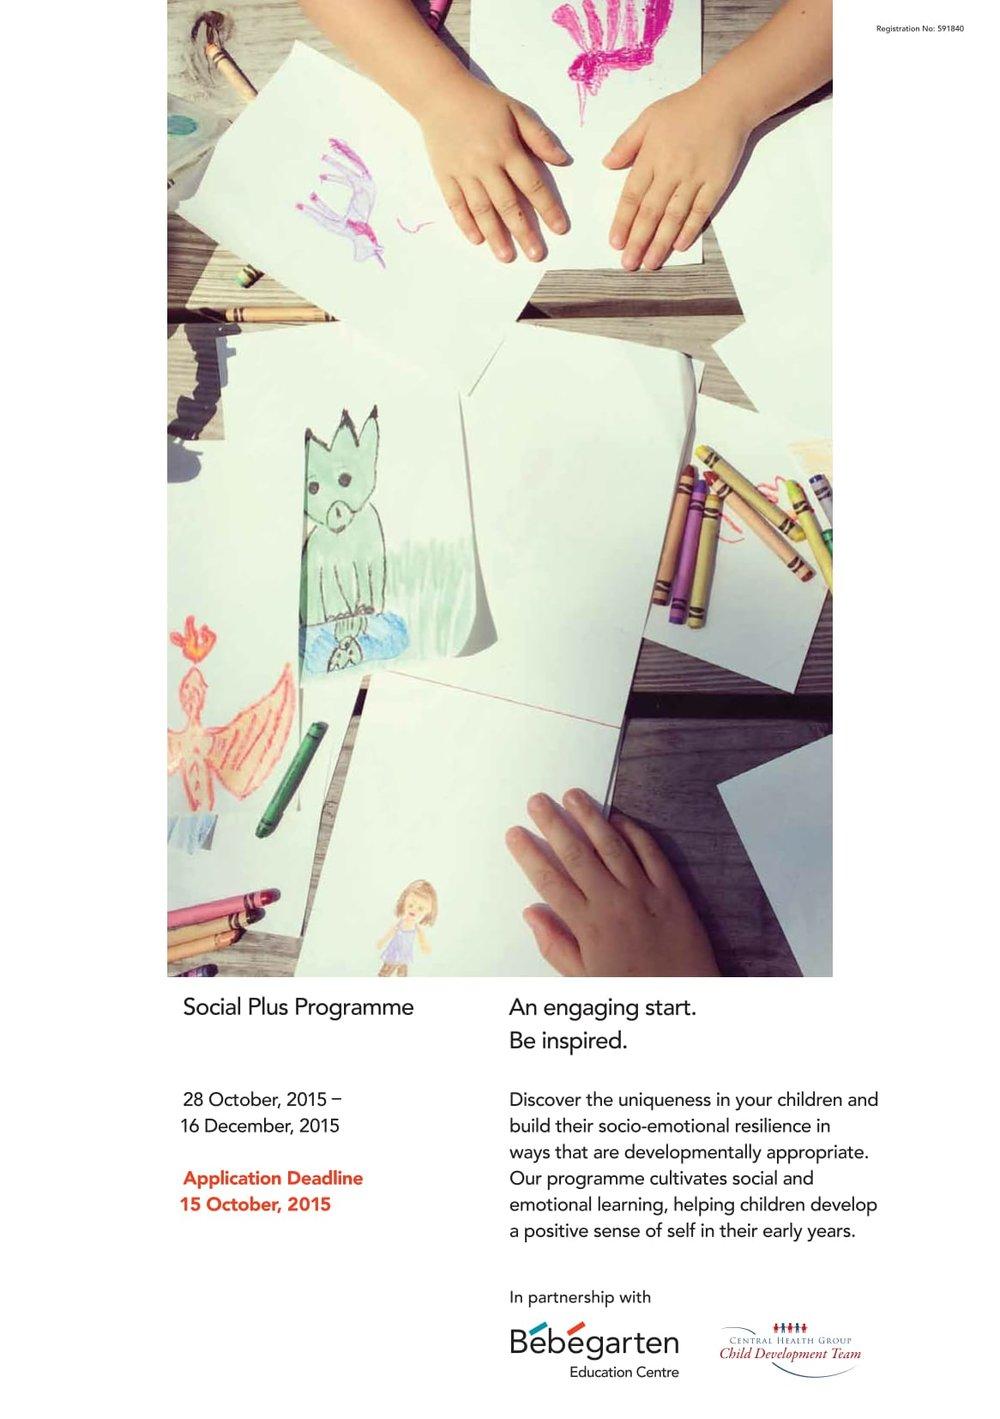 Social Plus Programme Leaflet_R-1.jpg